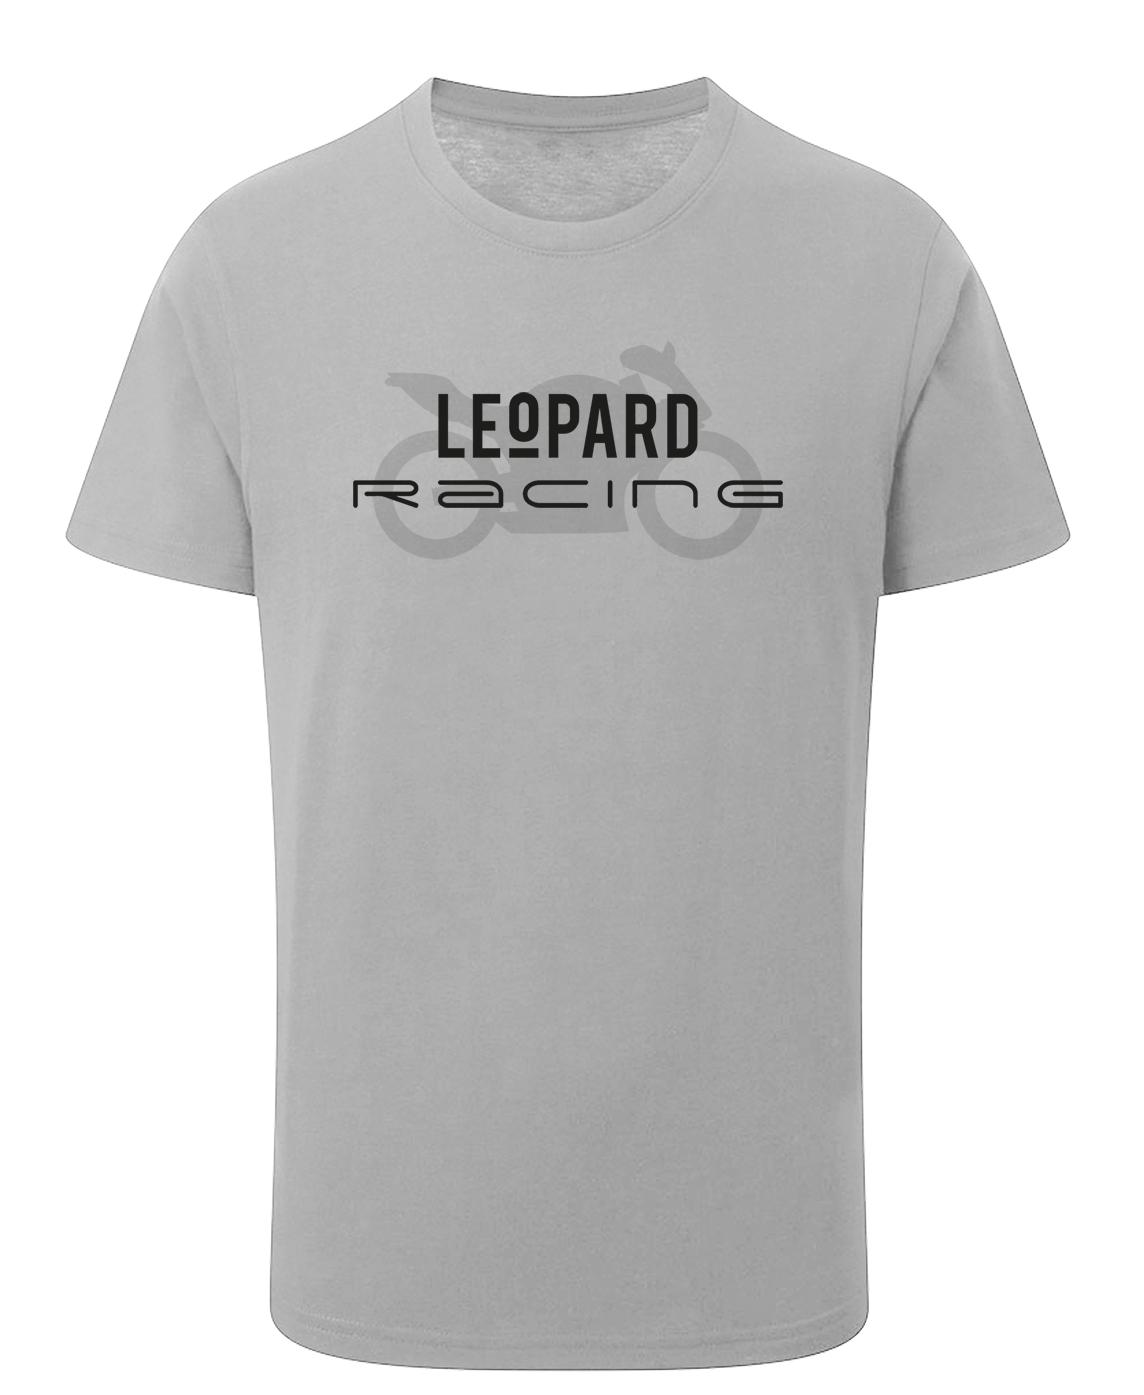 T-shirt Leopard Racing